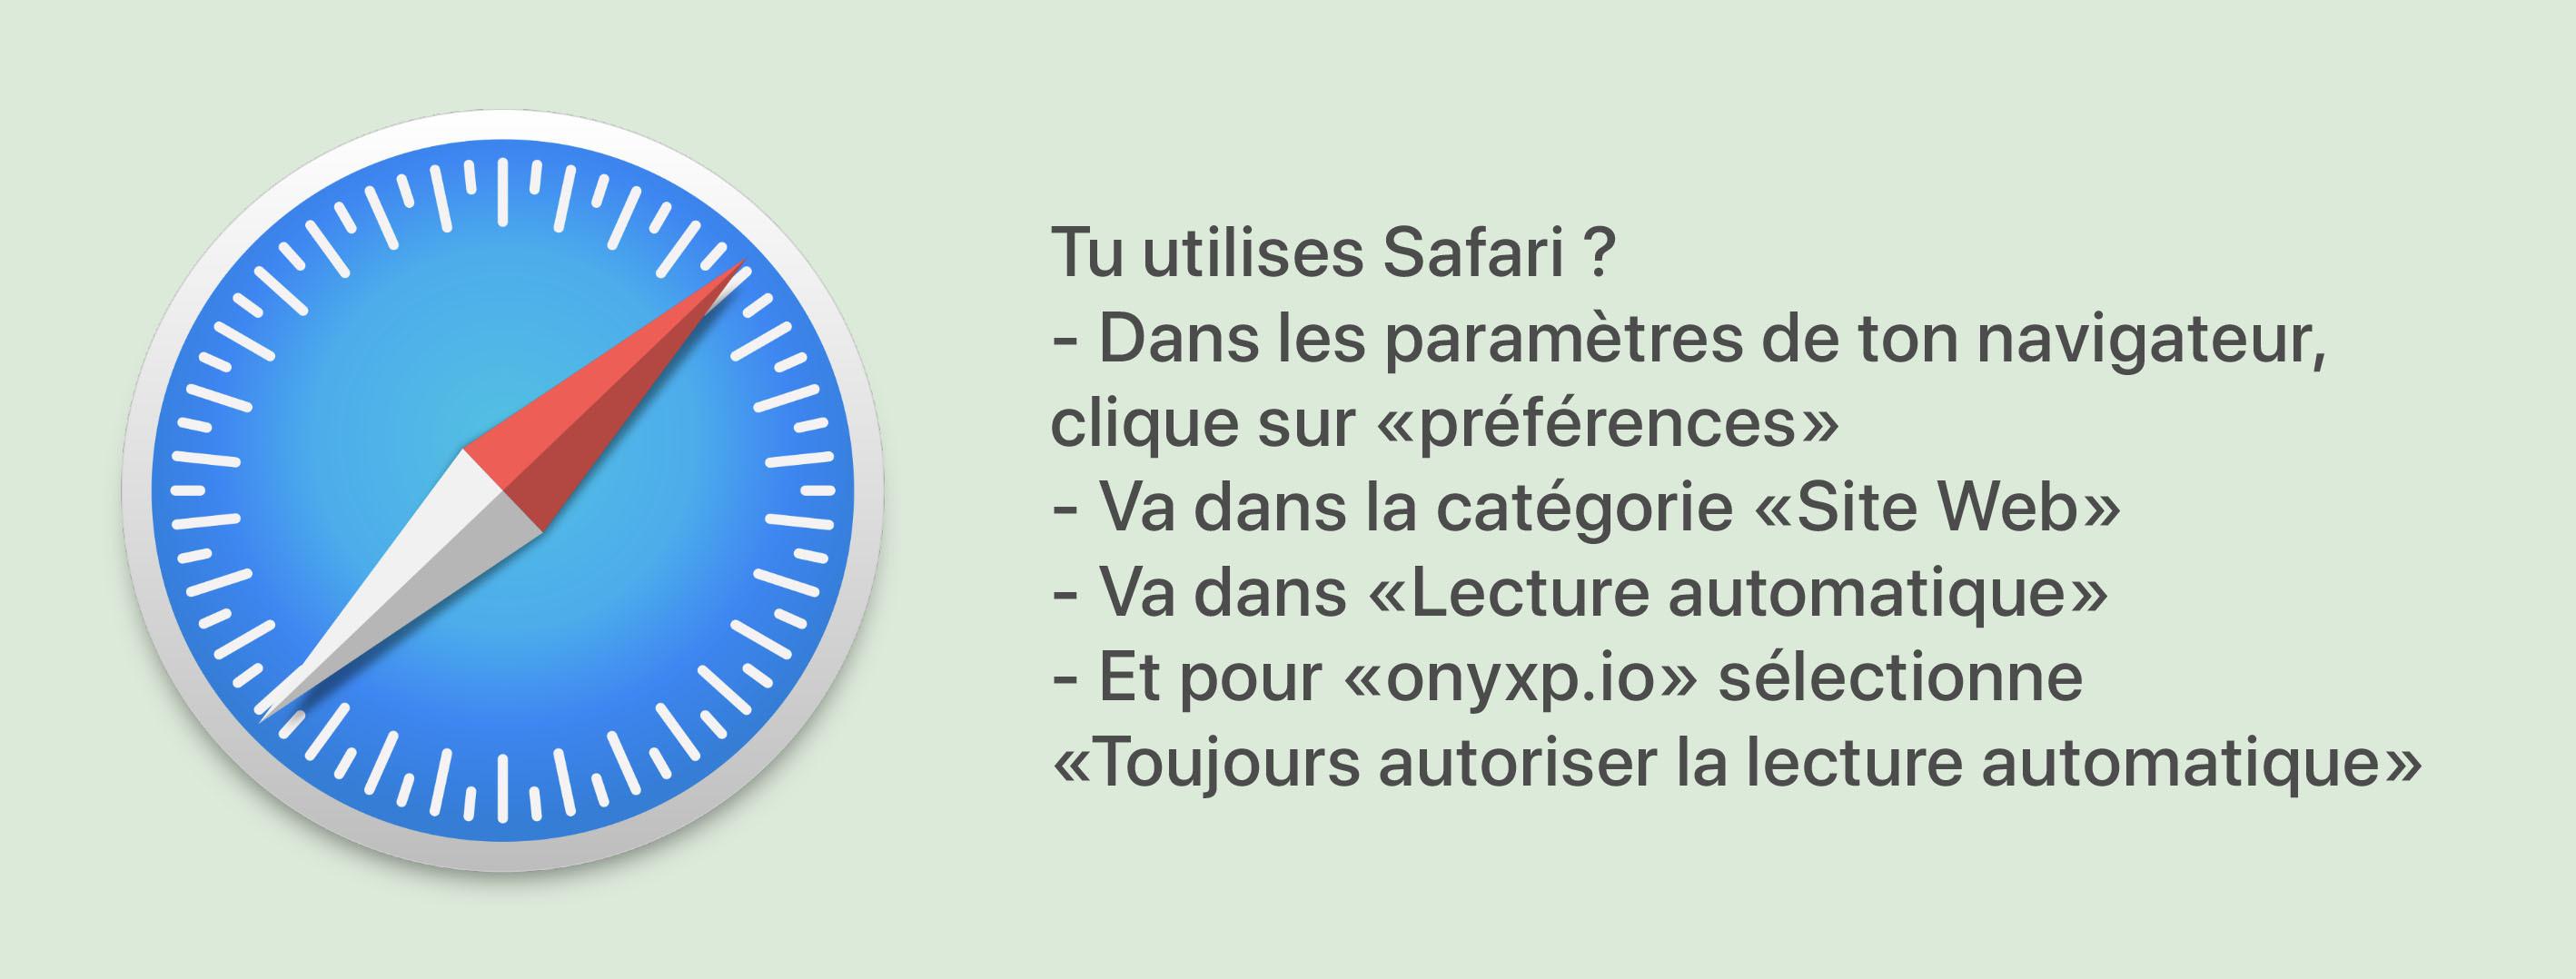 avertissement-safari